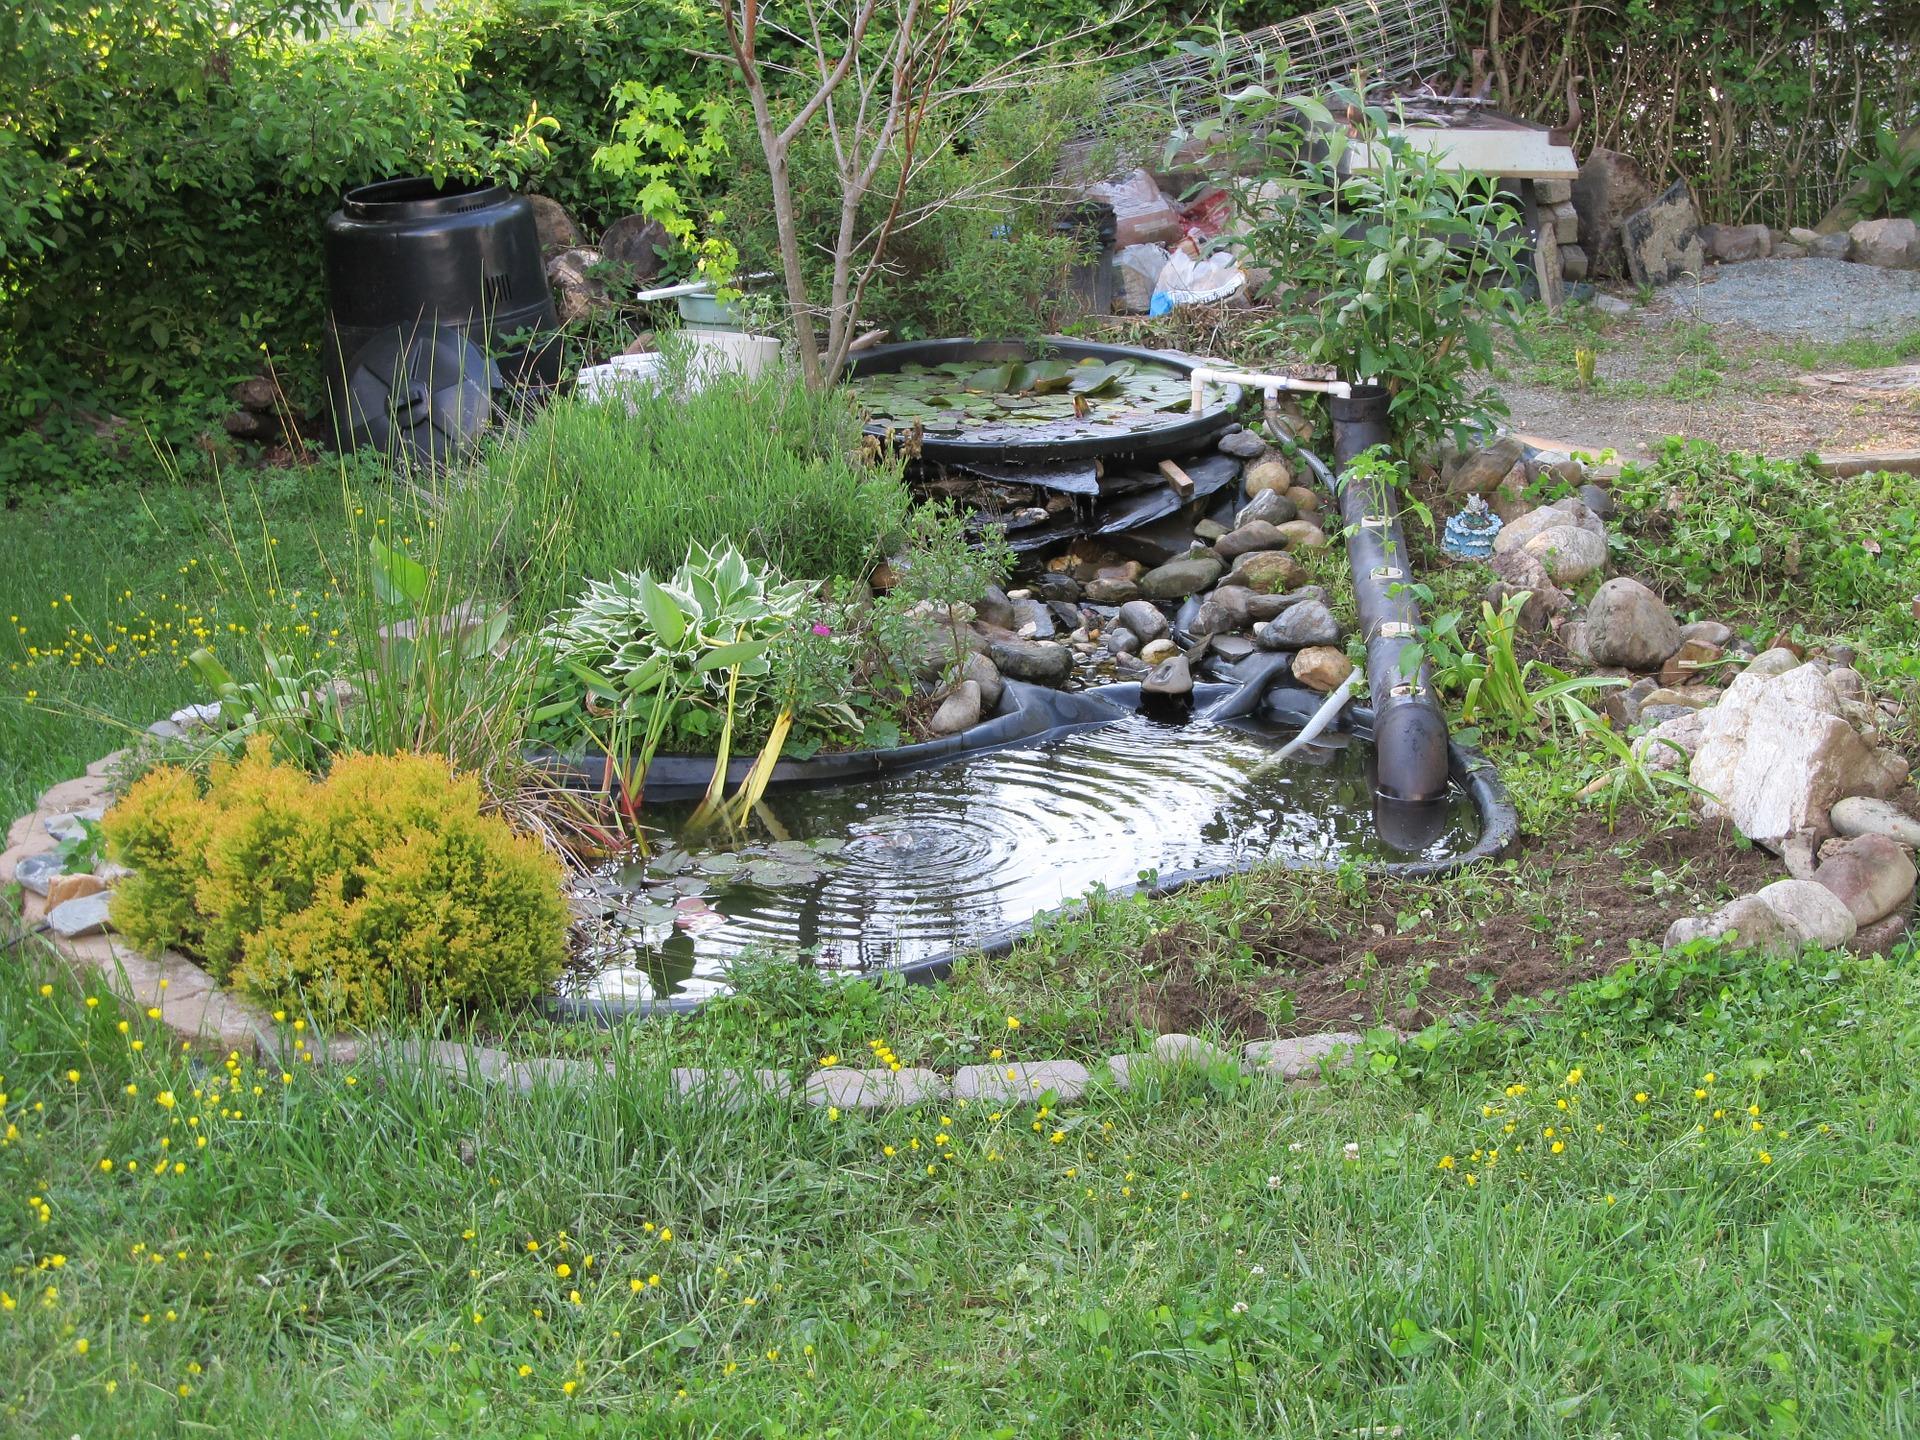 How to Turn Your Brilliant Backyard Pond Ideas into ... on Yard Ponds Ideas id=63151